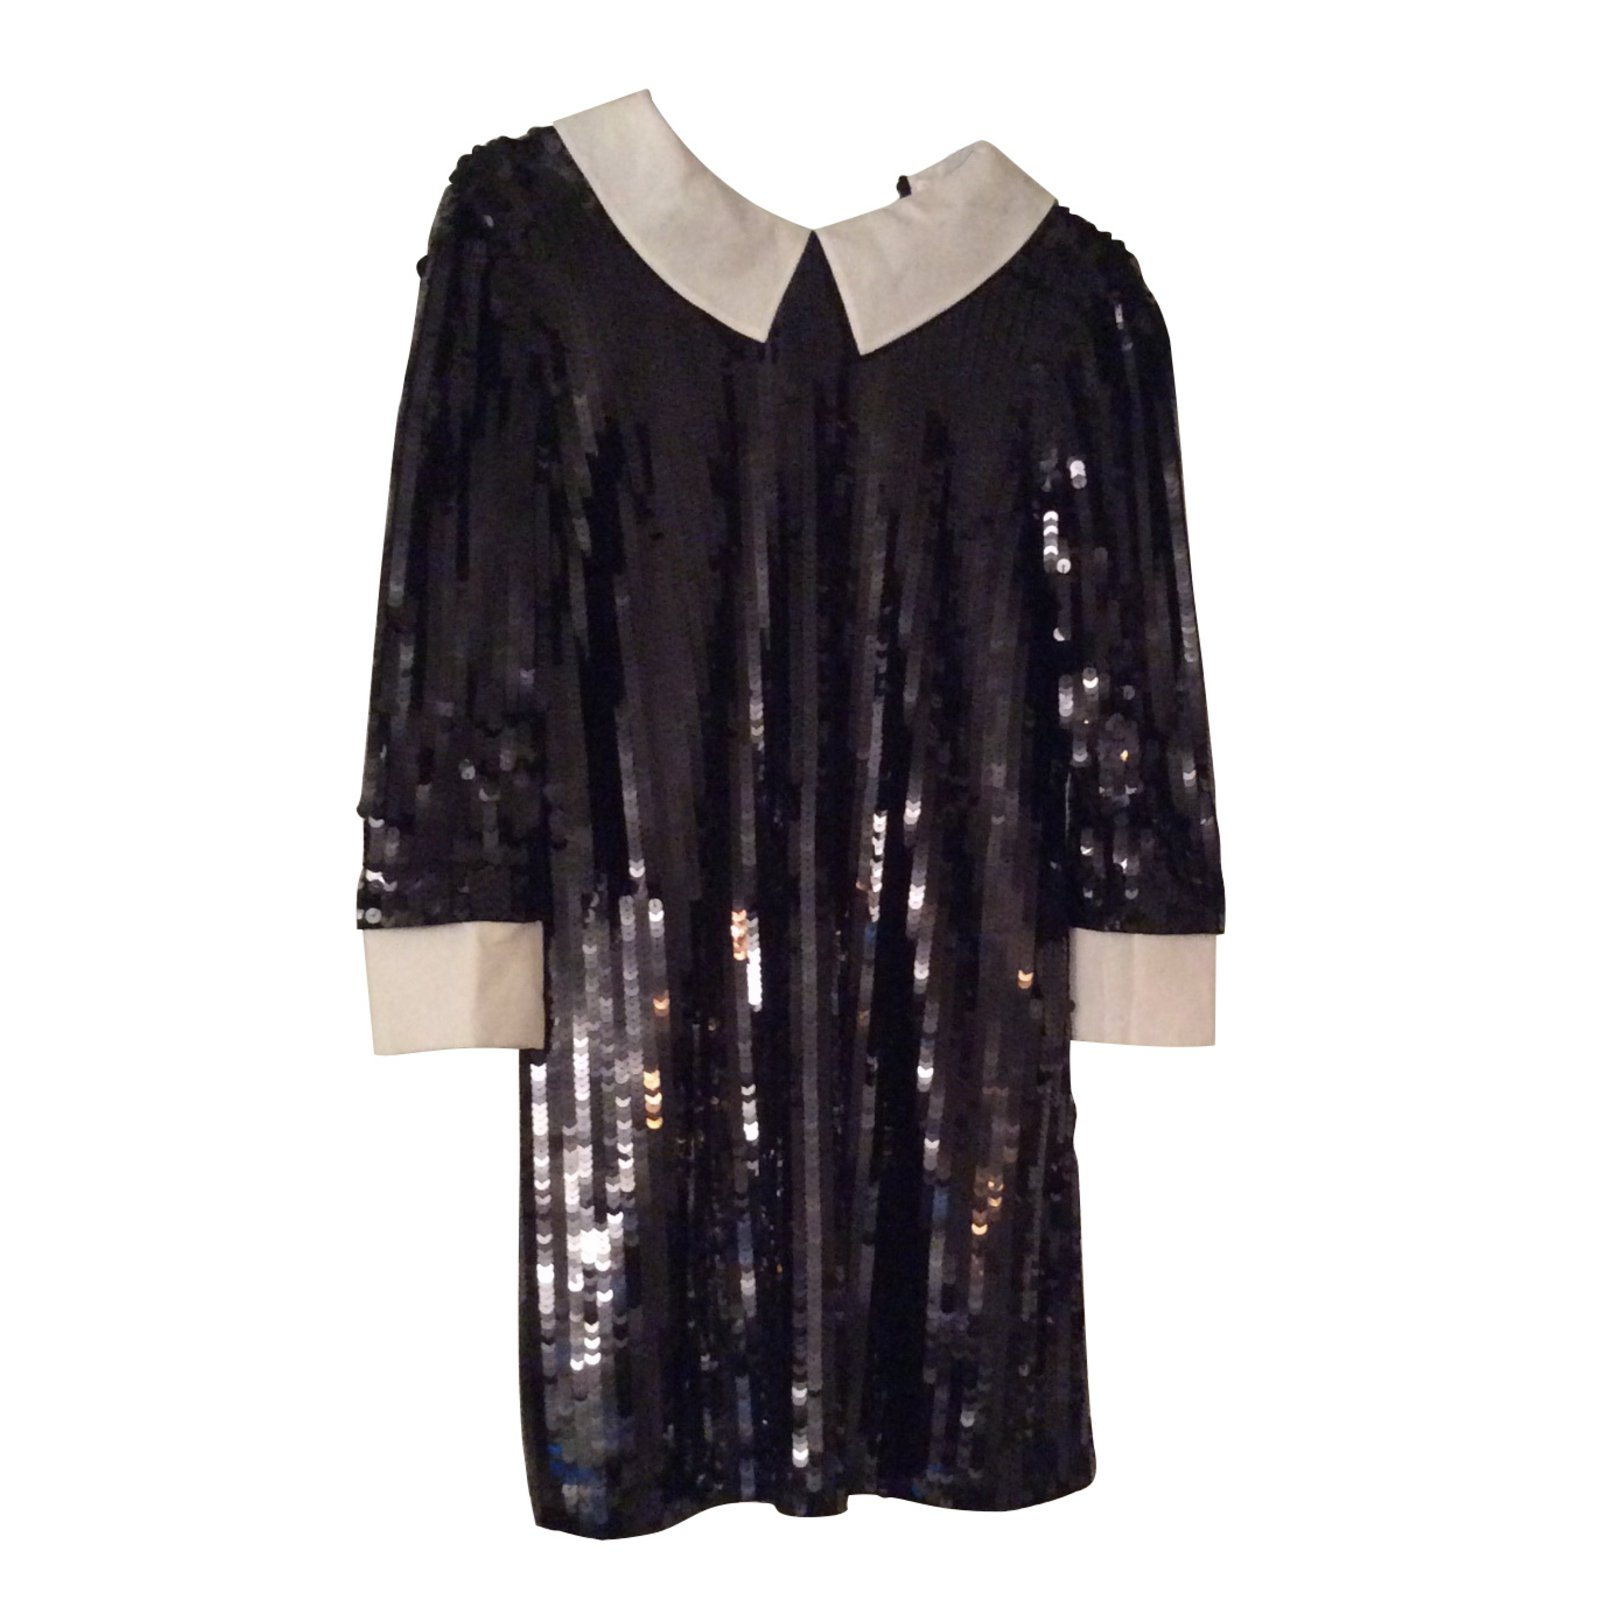 b8c79ad14c9 Sonia By Sonia Rykiel Dresses Dresses Other Black ref.9436 - Joli Closet